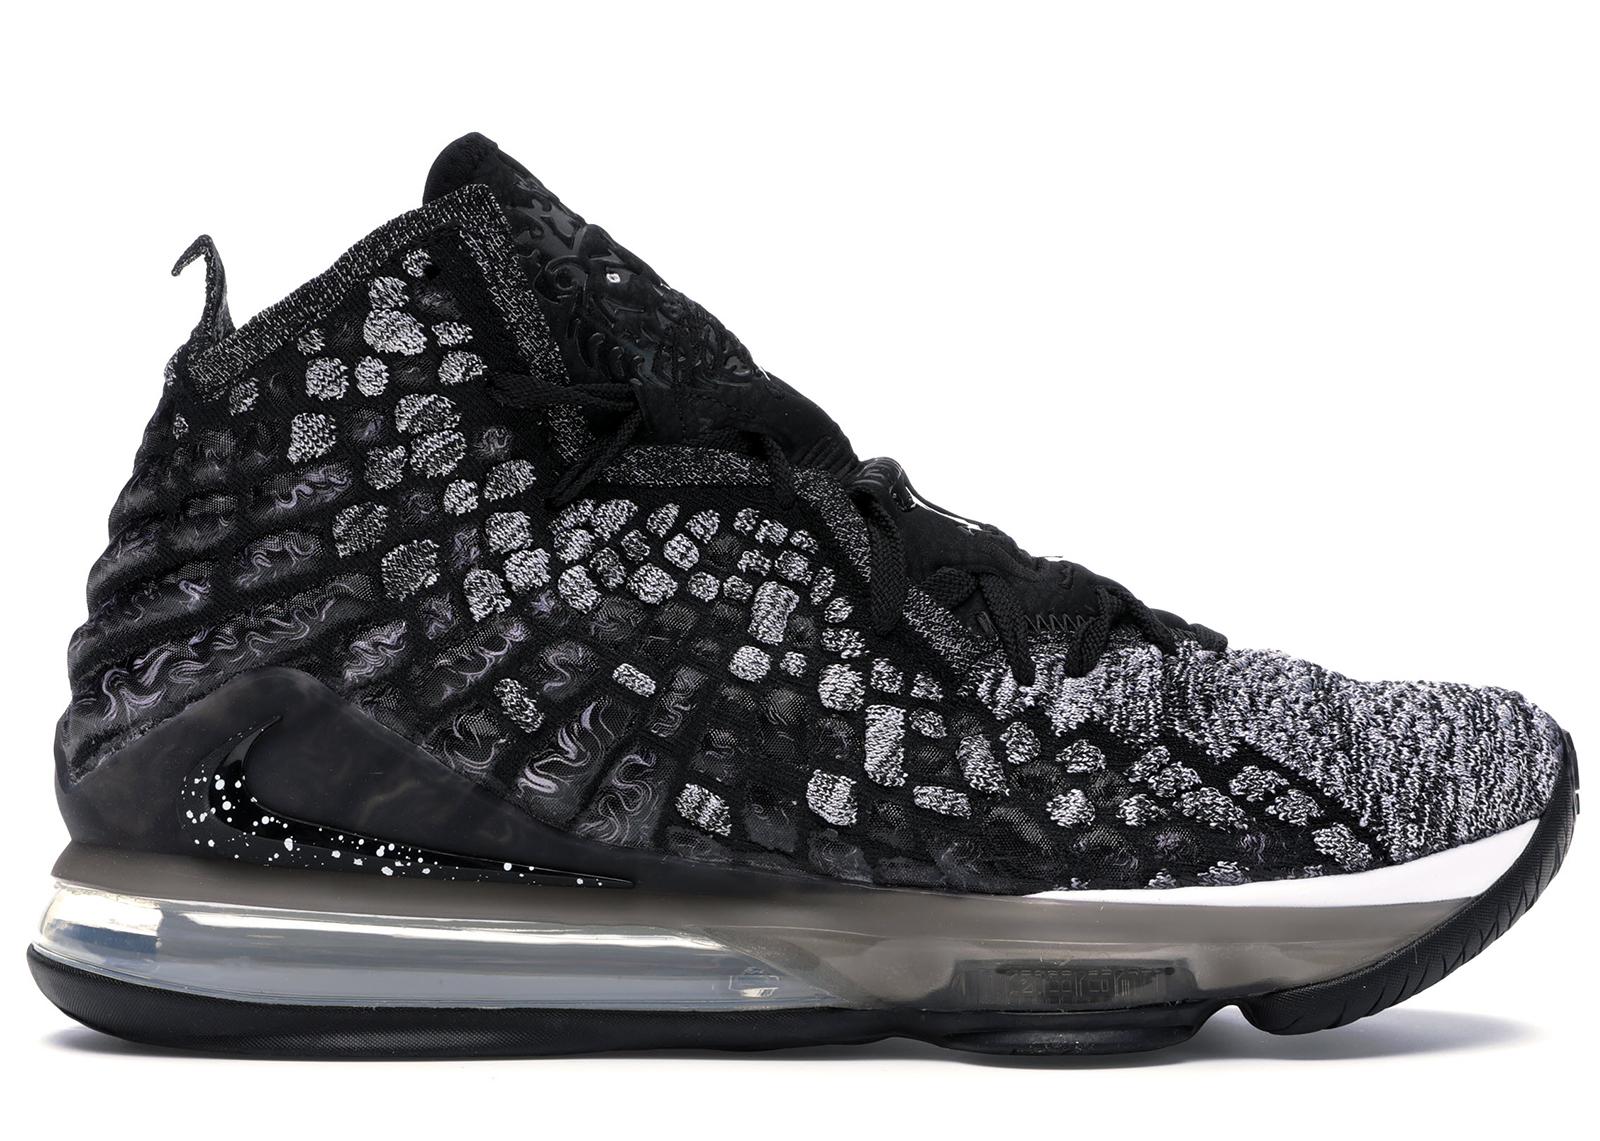 Nike LeBron 17 Black White - BQ3177-002